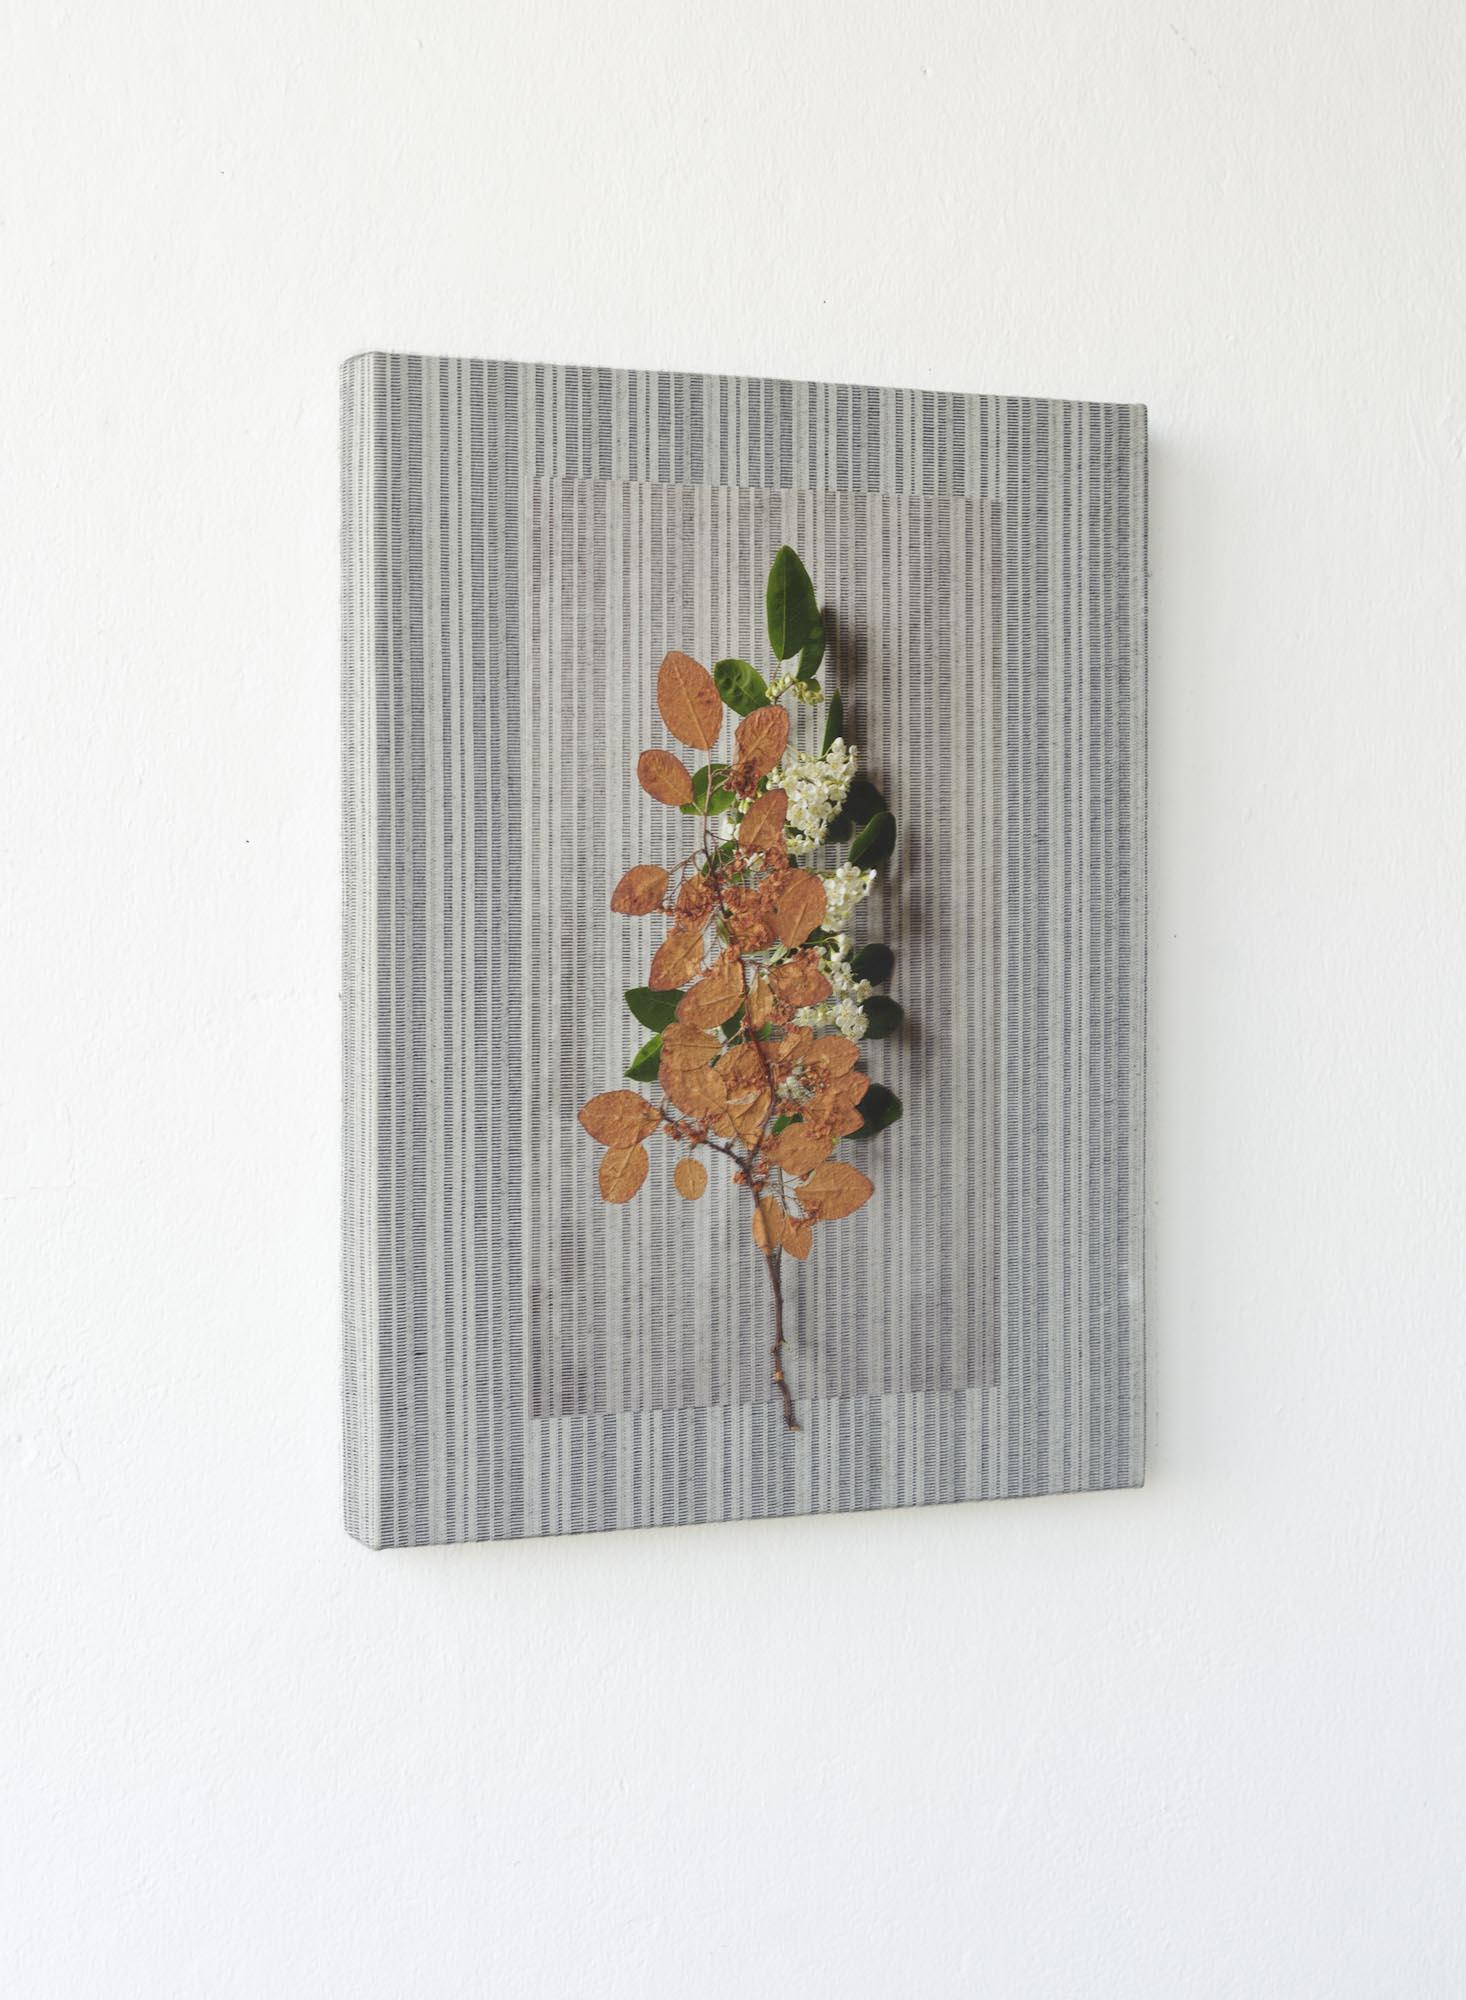 Dried plant, art work of Ilia beckmann